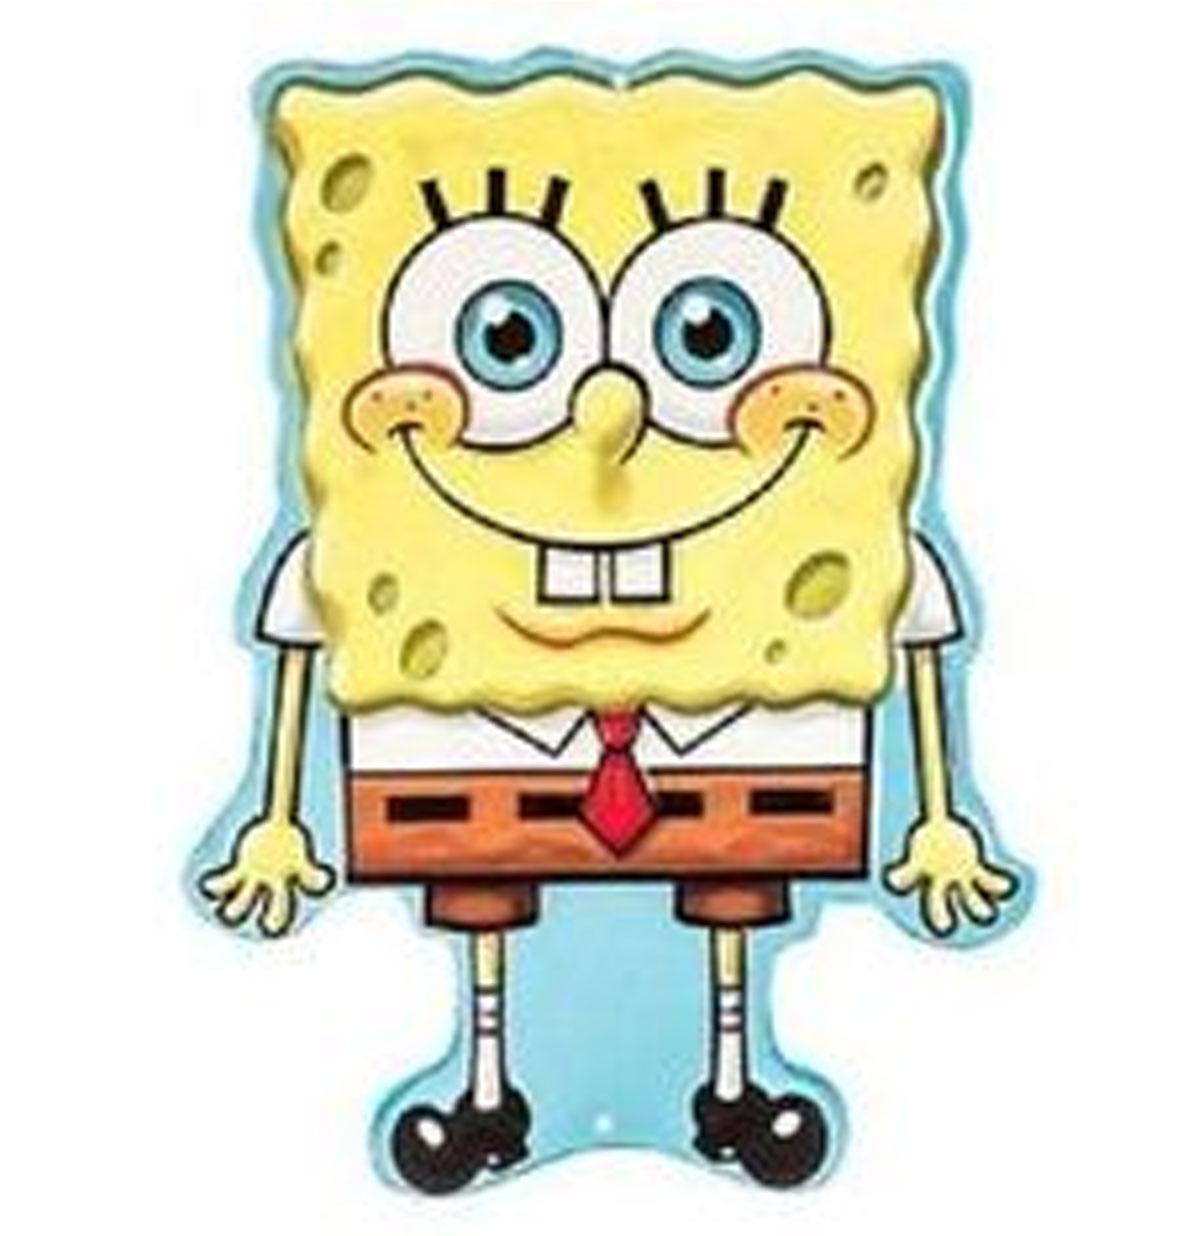 Spongebob Reliëf Tinnen Bord